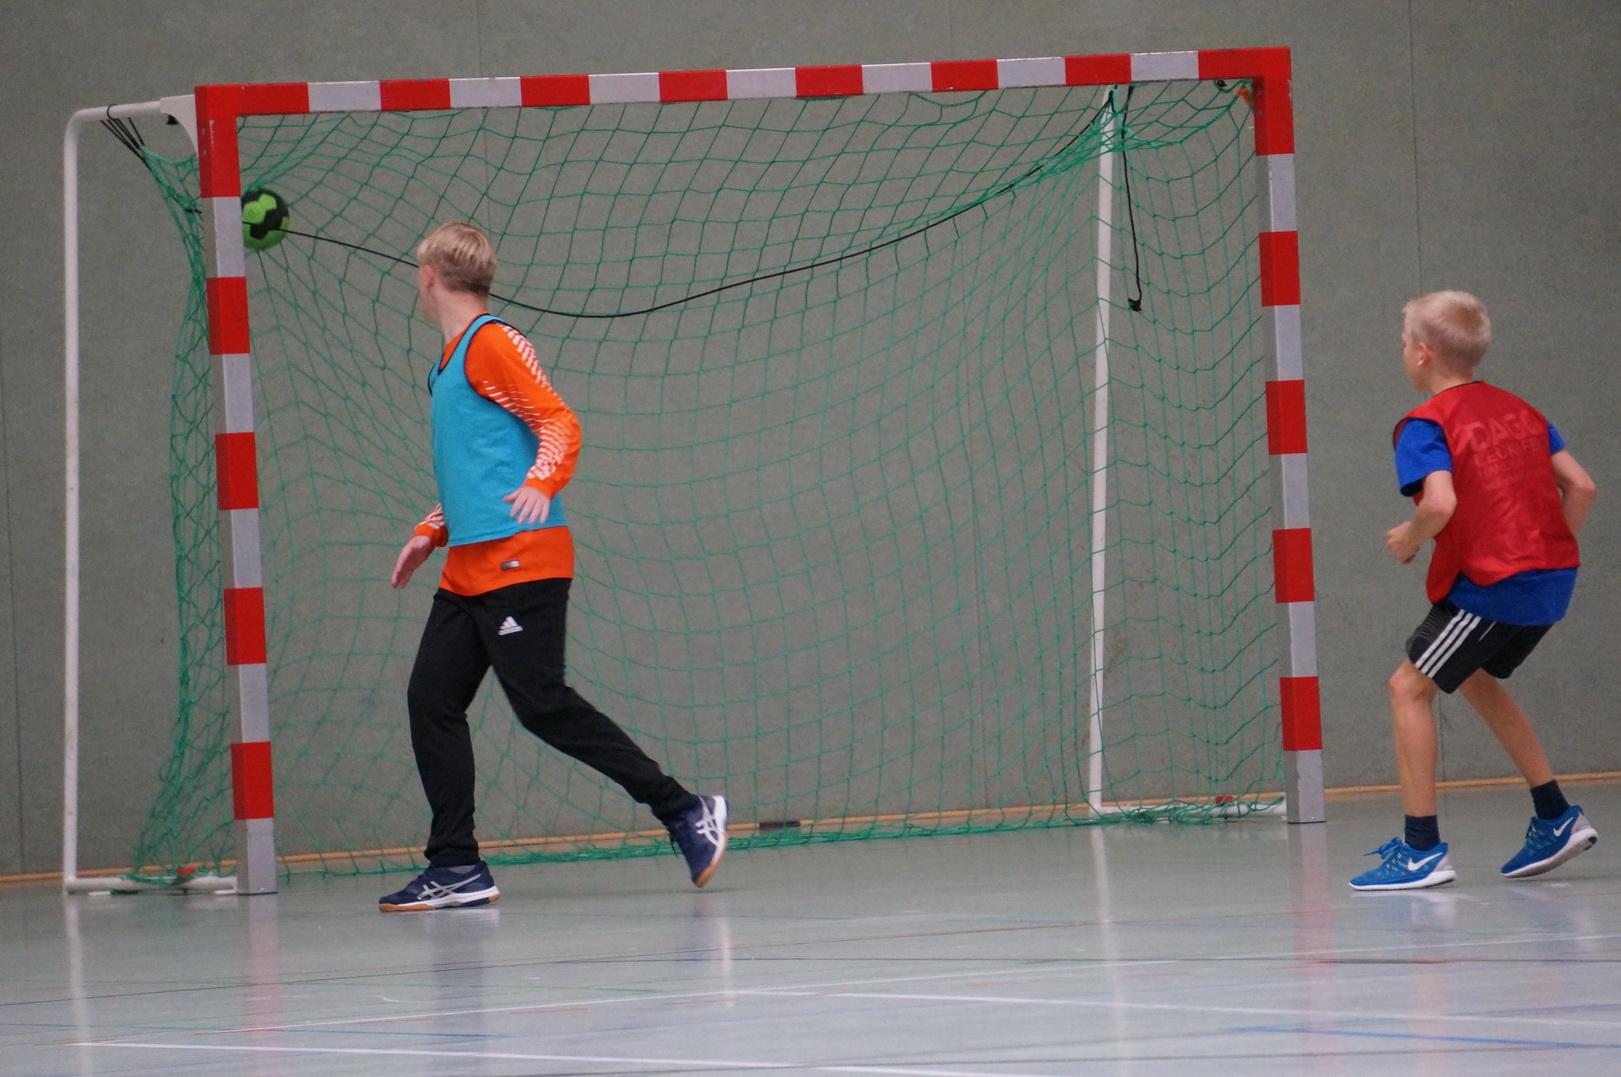 201808_Handballcamp_SDH_MG_273w